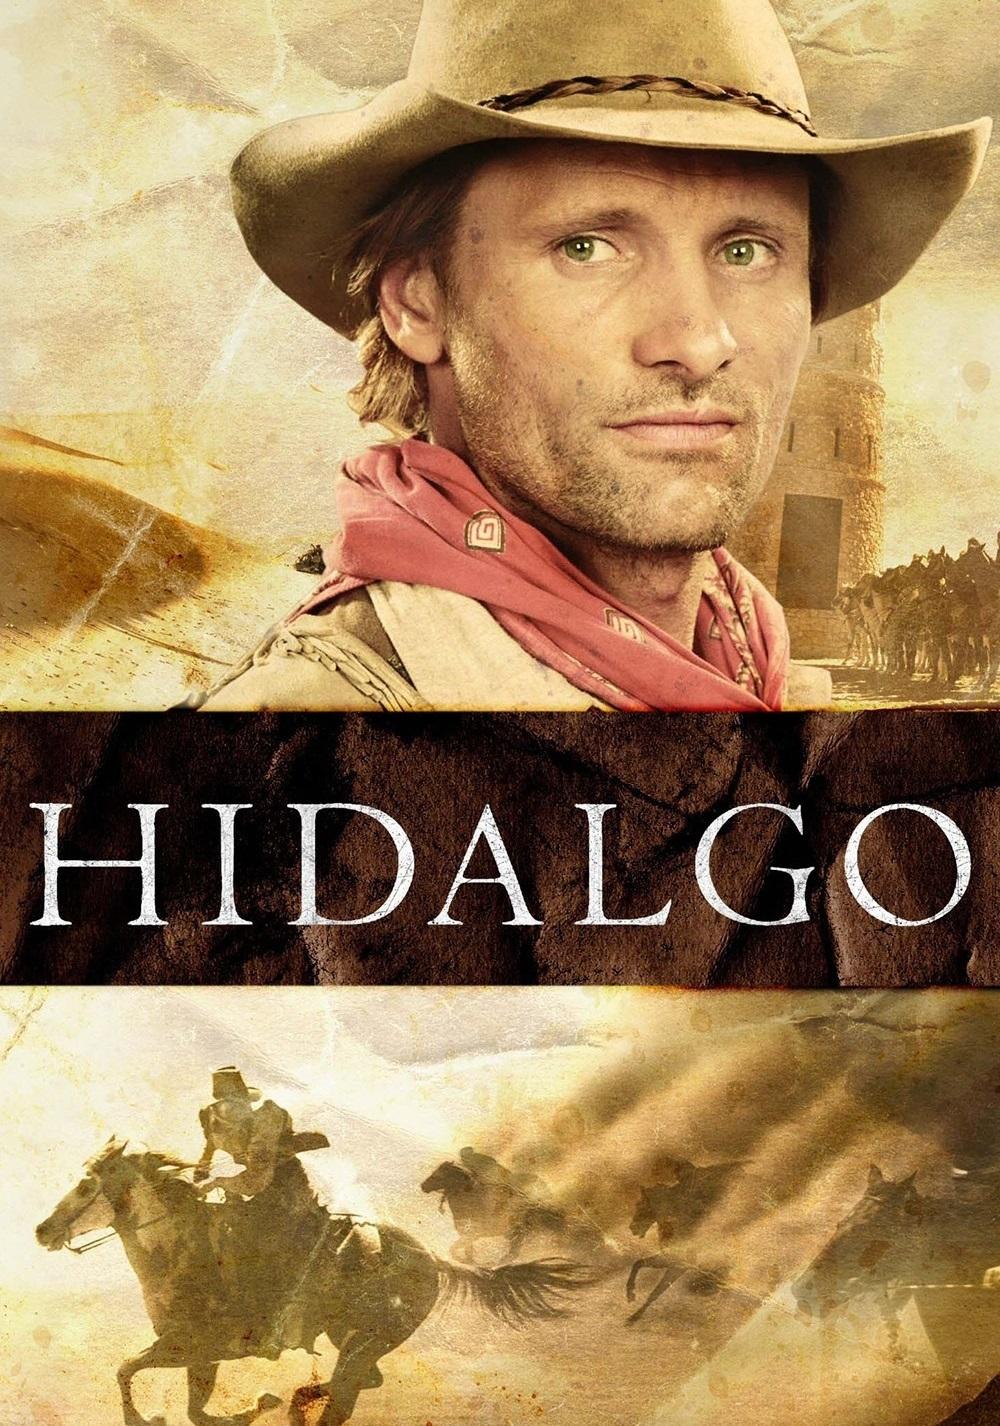 Hidalgo Film